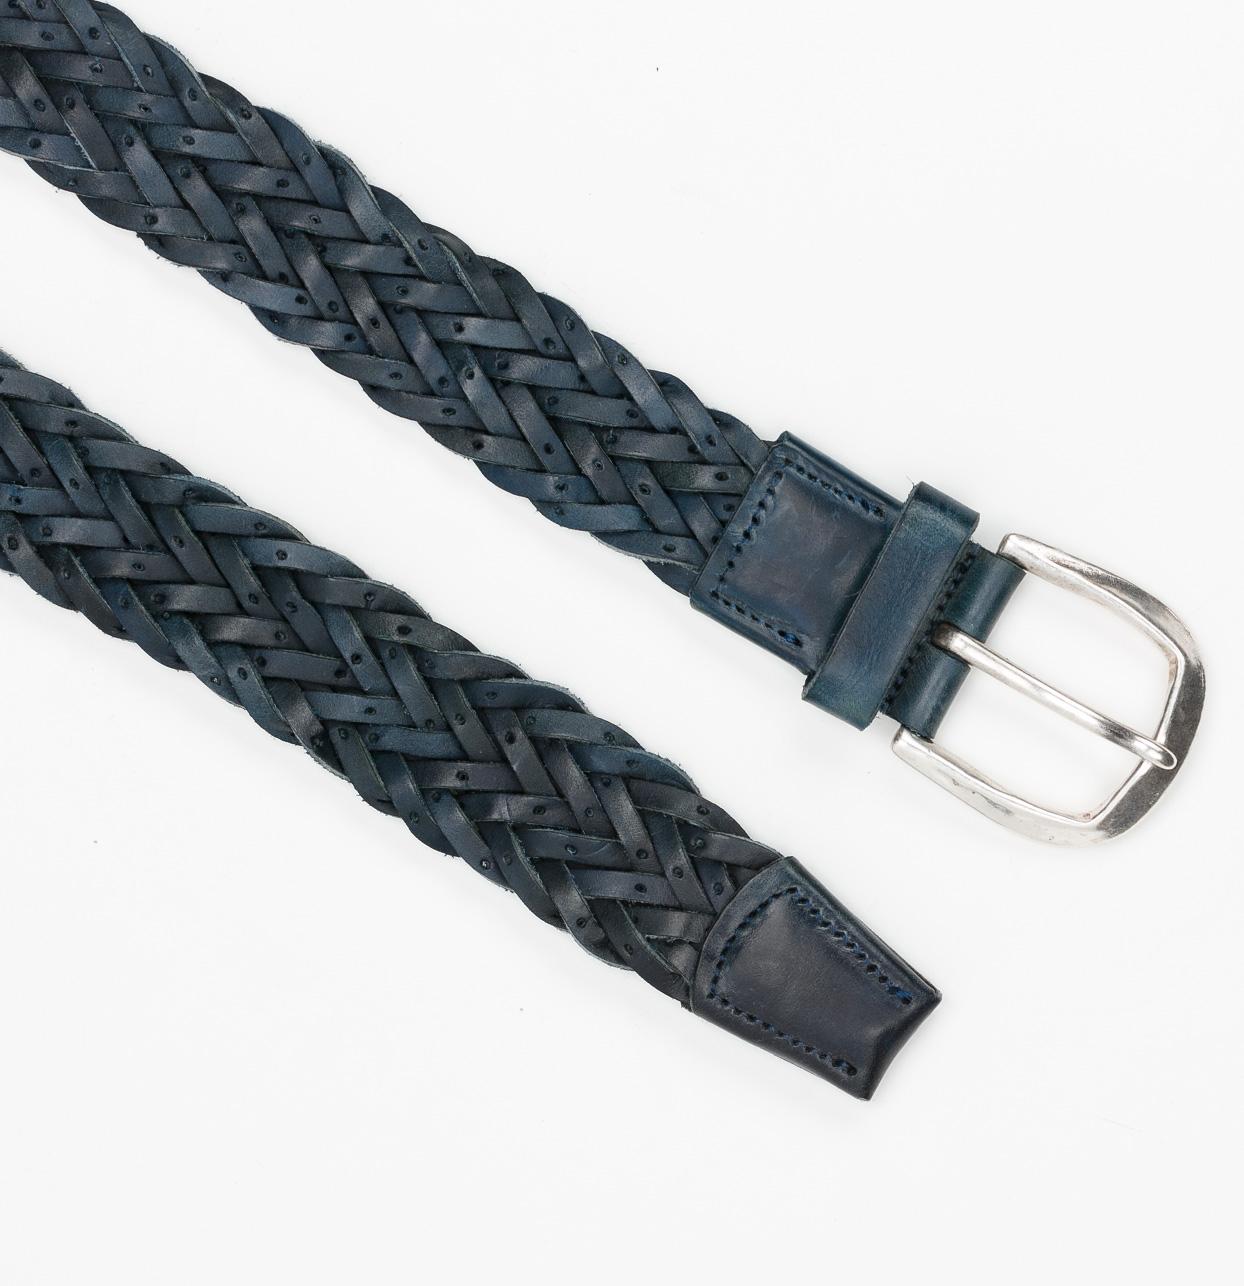 Cinturón Sport piel trenzada color azul, 100% piel. - Ítem1